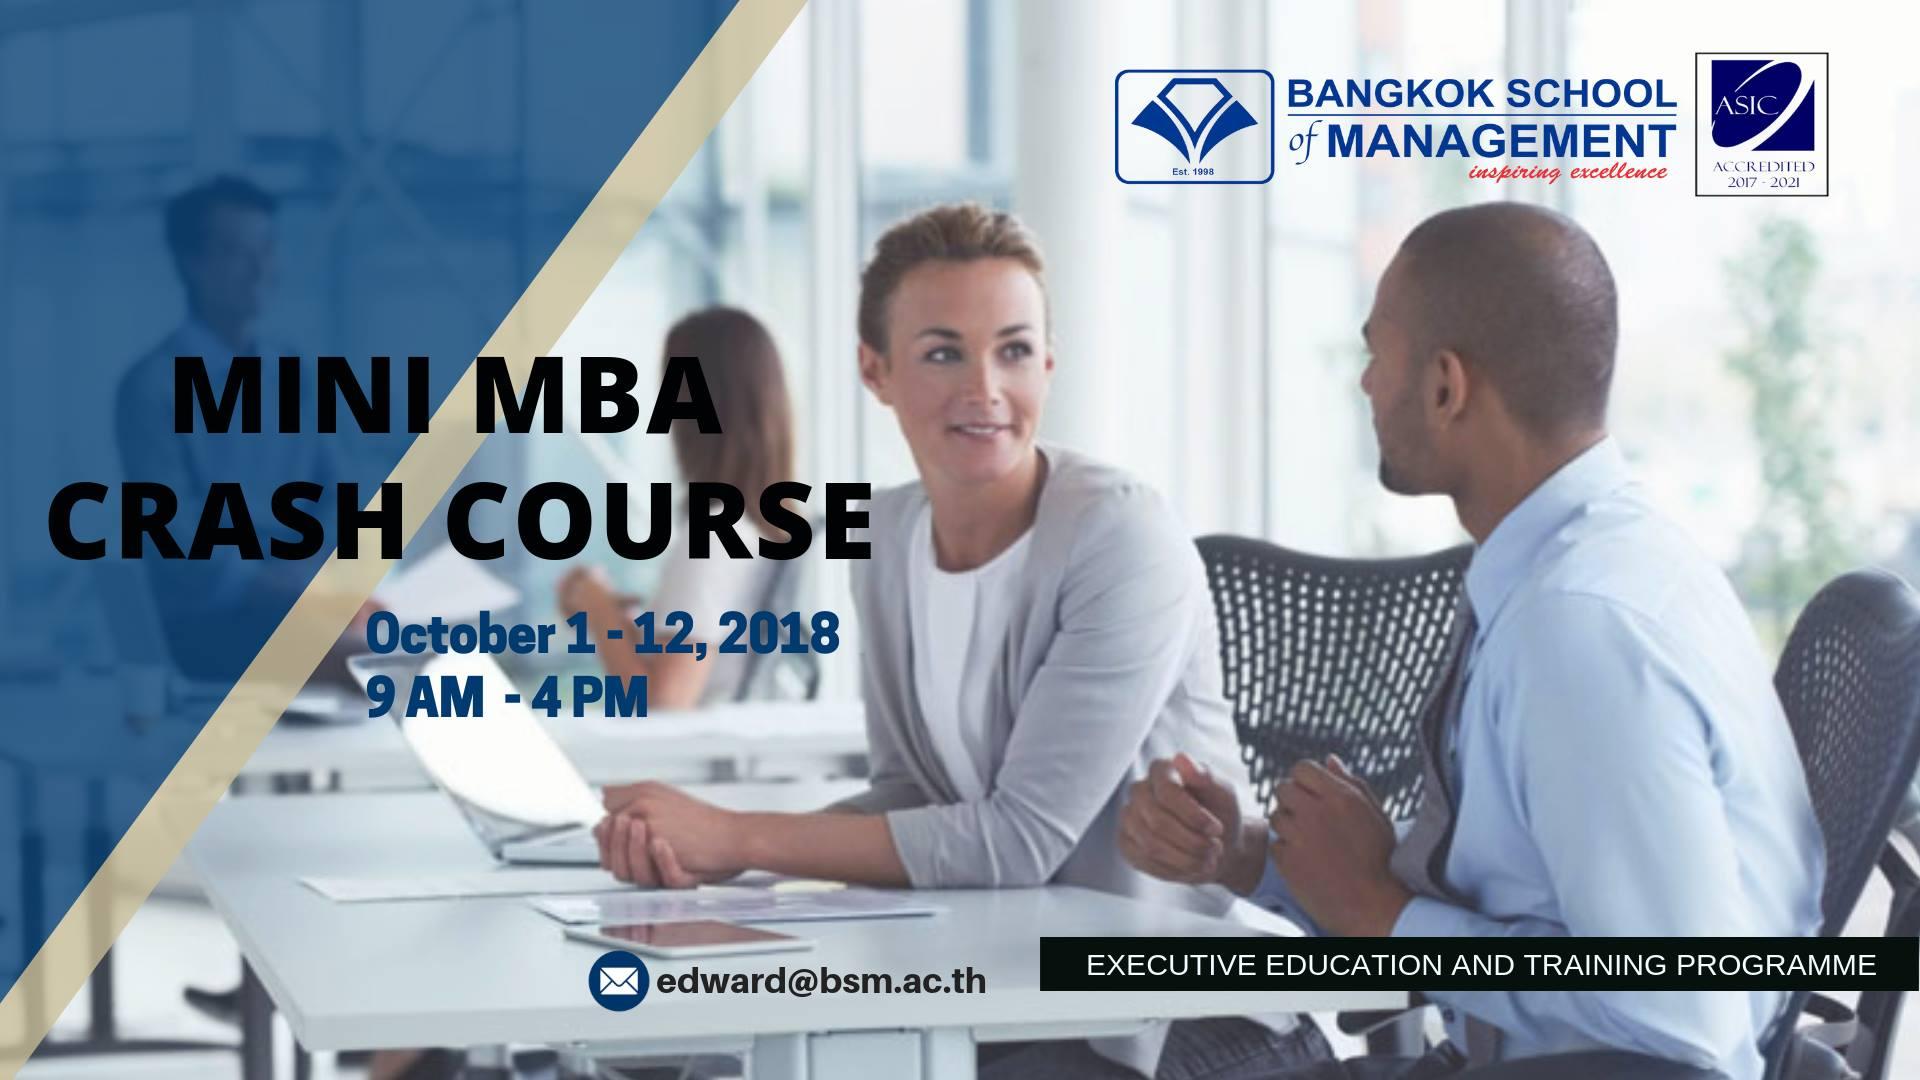 Date: October 1 &#8211; 12,2018 <br></br>MINI MBA Crash Course